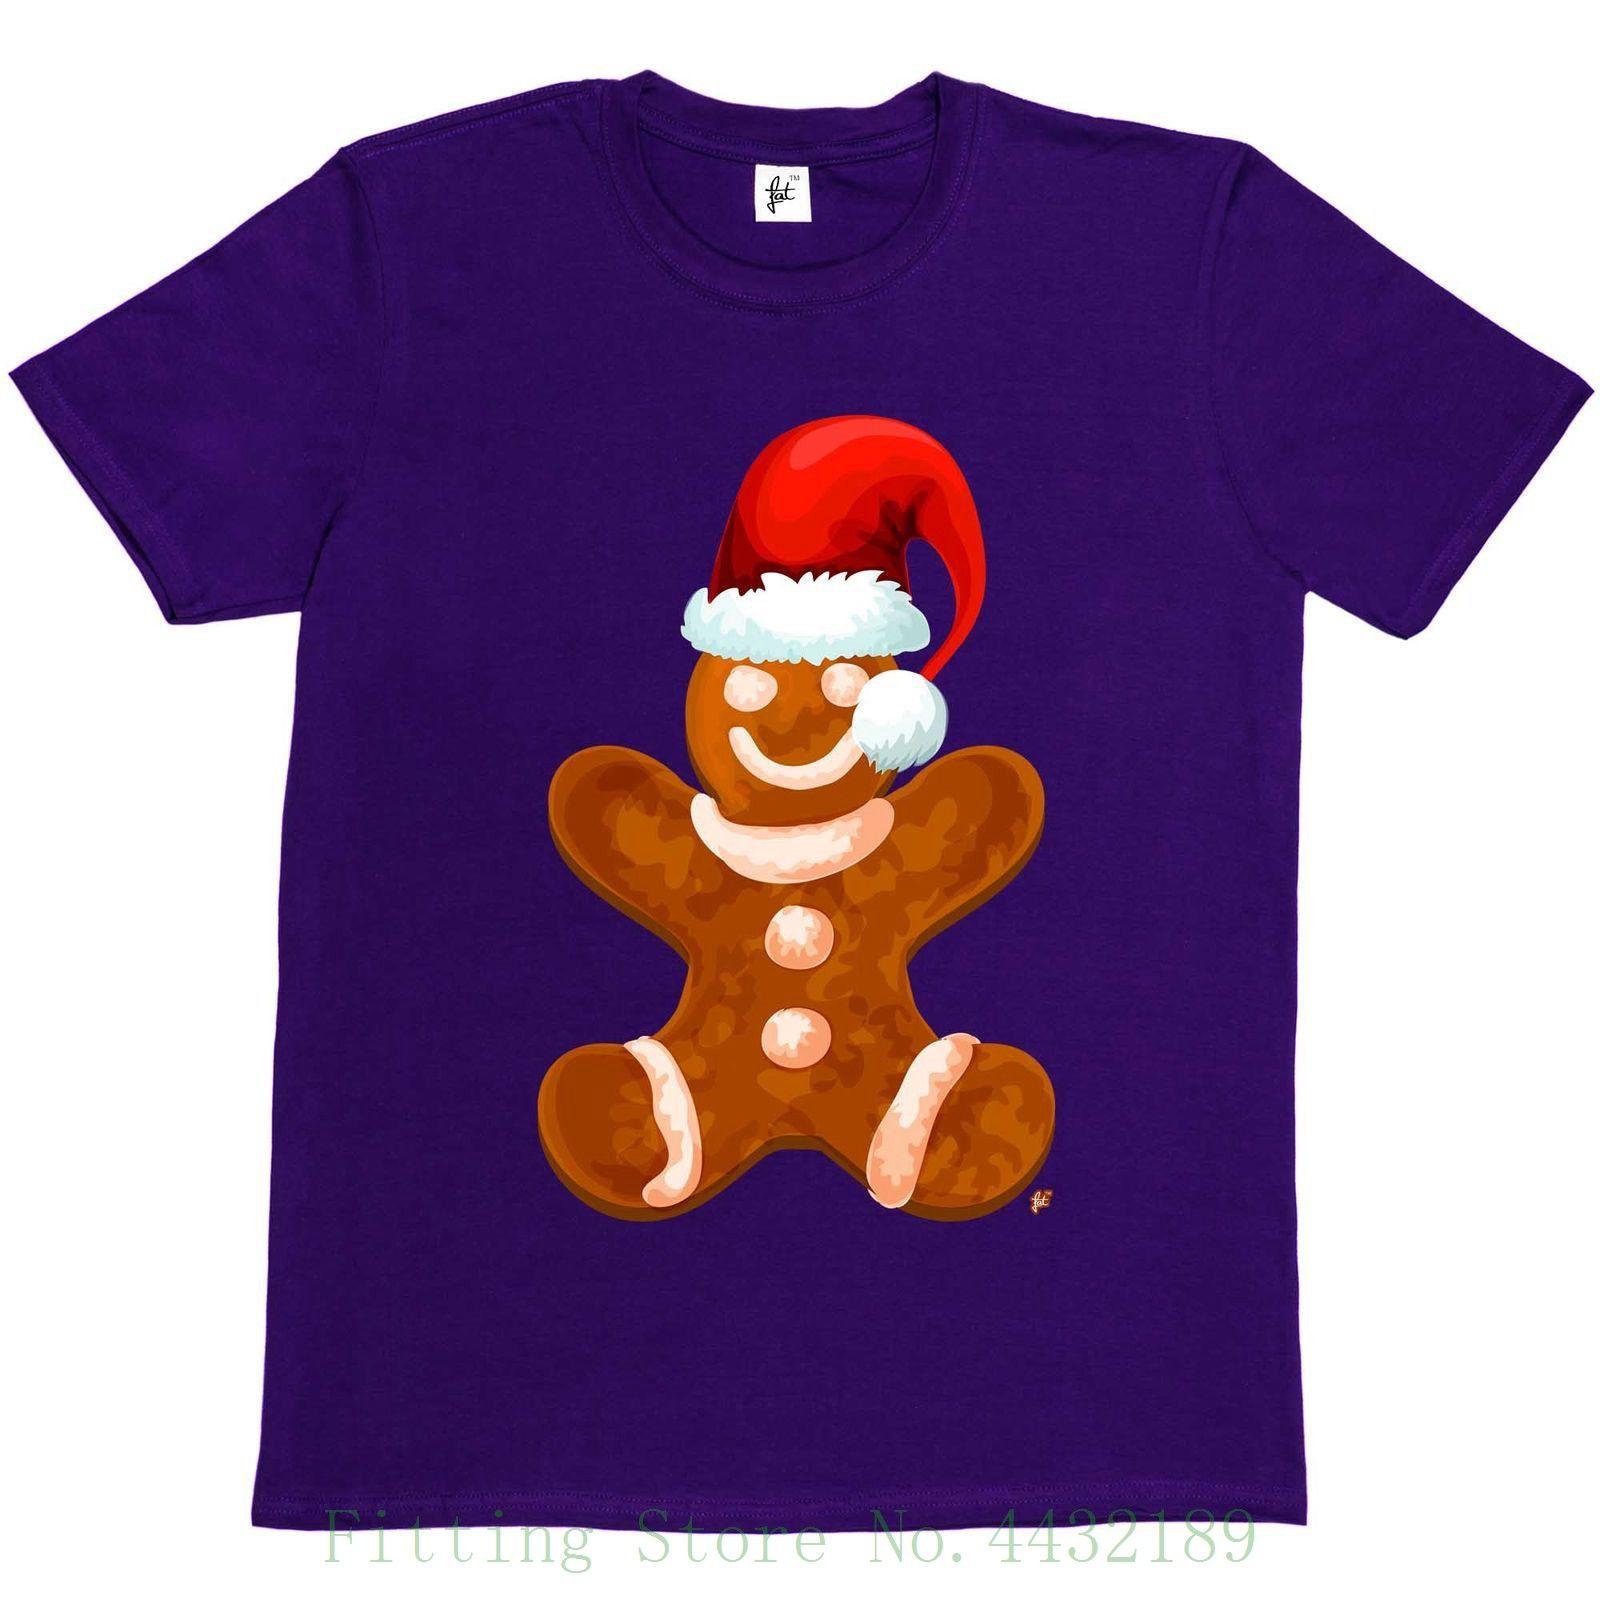 0c4964624 Compre Homem De Gengibre Feliz Vestindo Vermelho Chapéu De Santa Natal Mens  T Camisa Manga Curta Estilo Verão De Aaa888tshirts